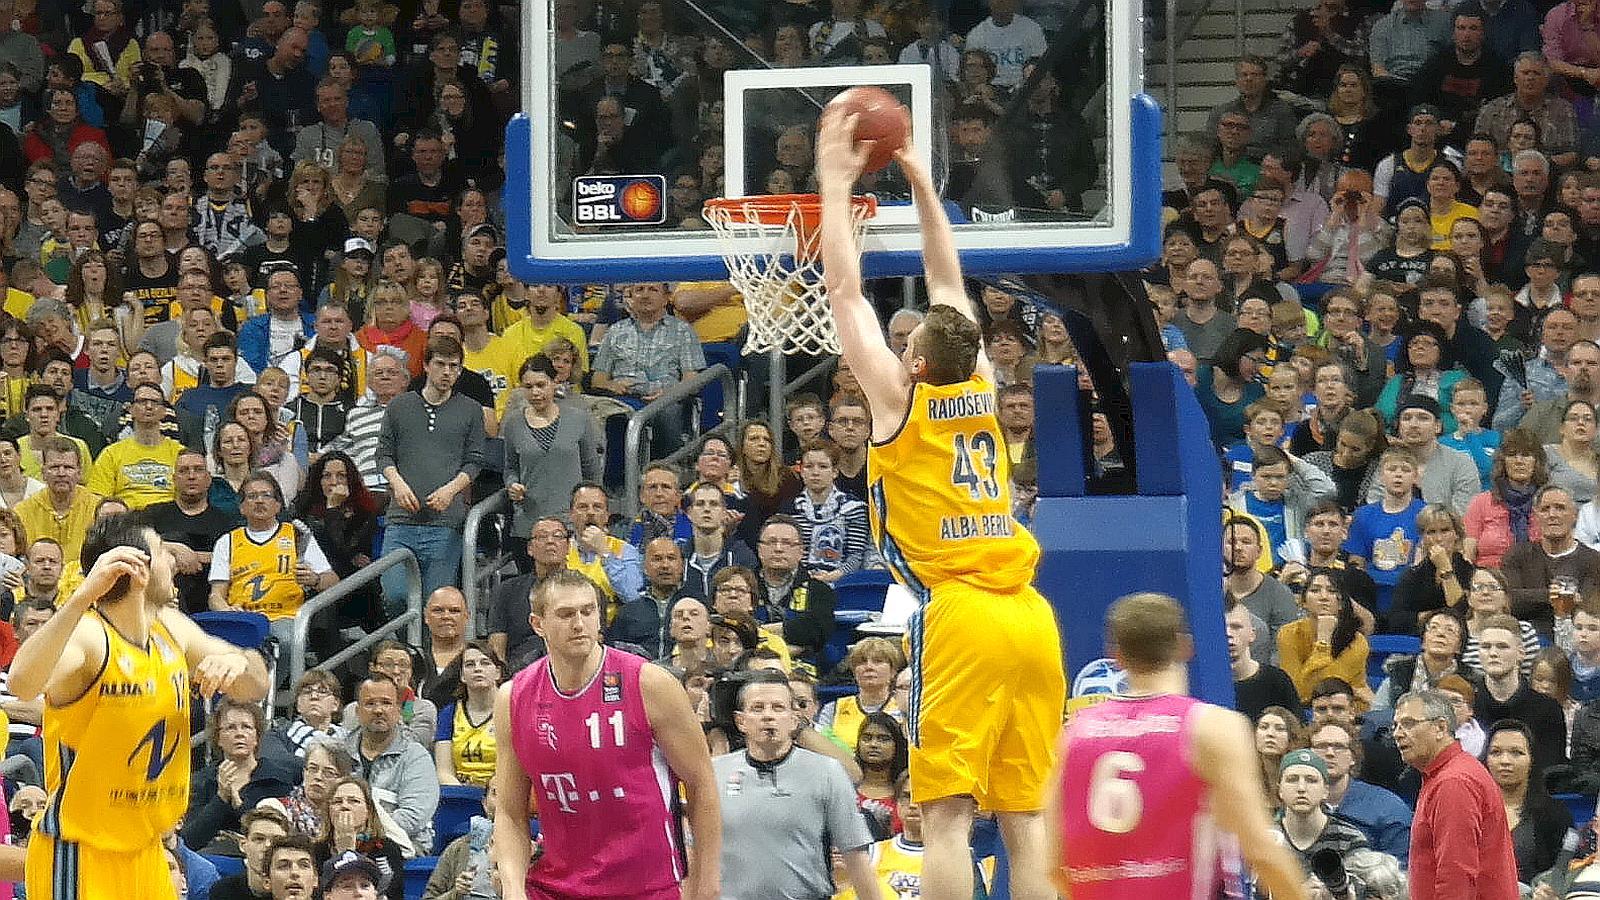 man of the match: Leon Radosevic